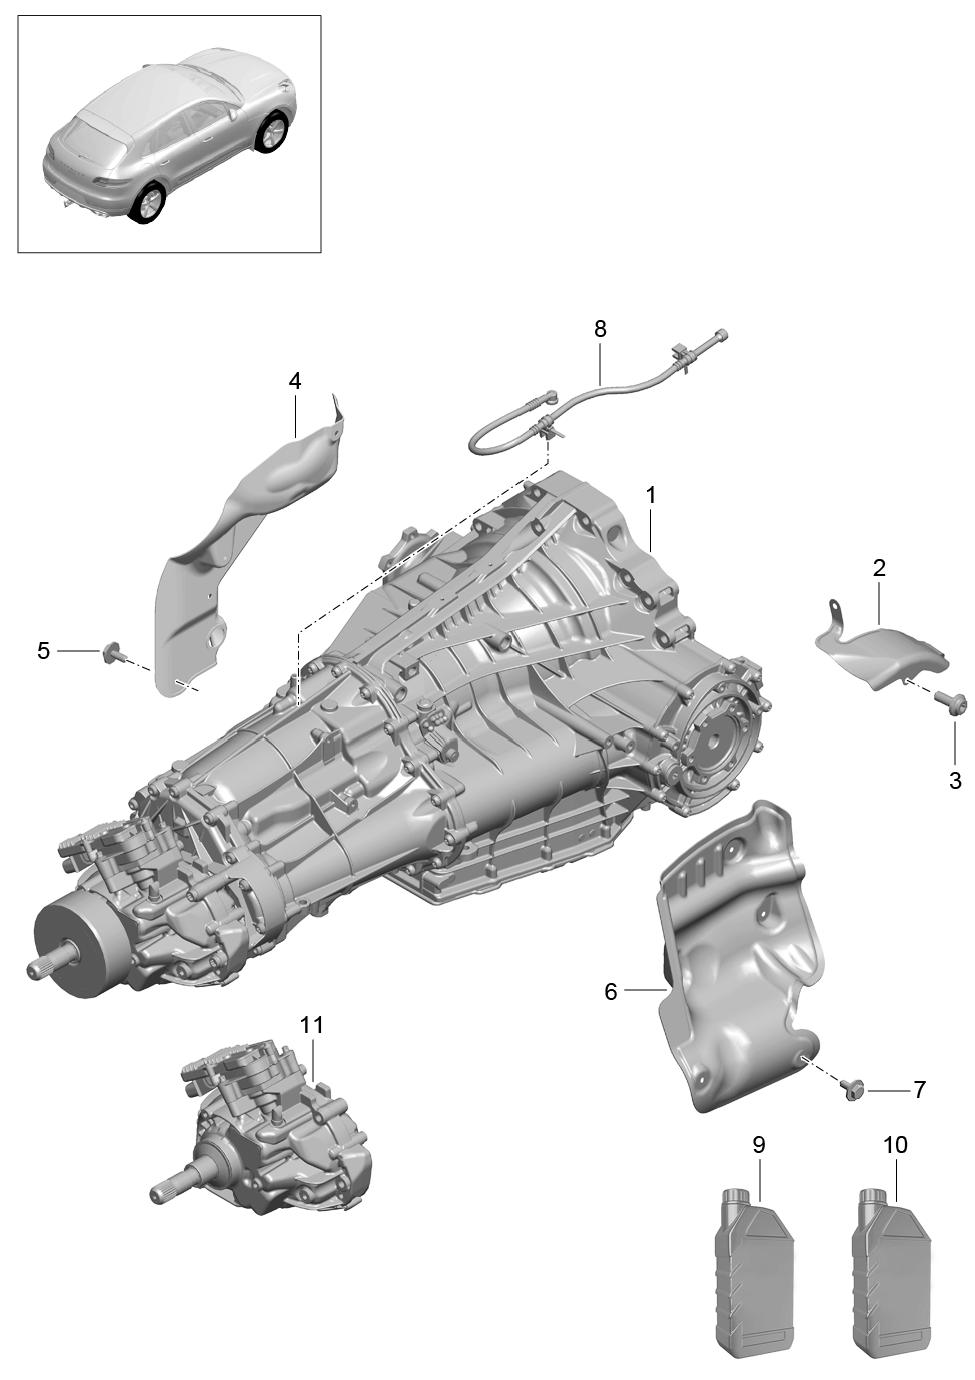 Macan Shift Pattern Reversed Page 2 Porsche Forum Wiring Diagram